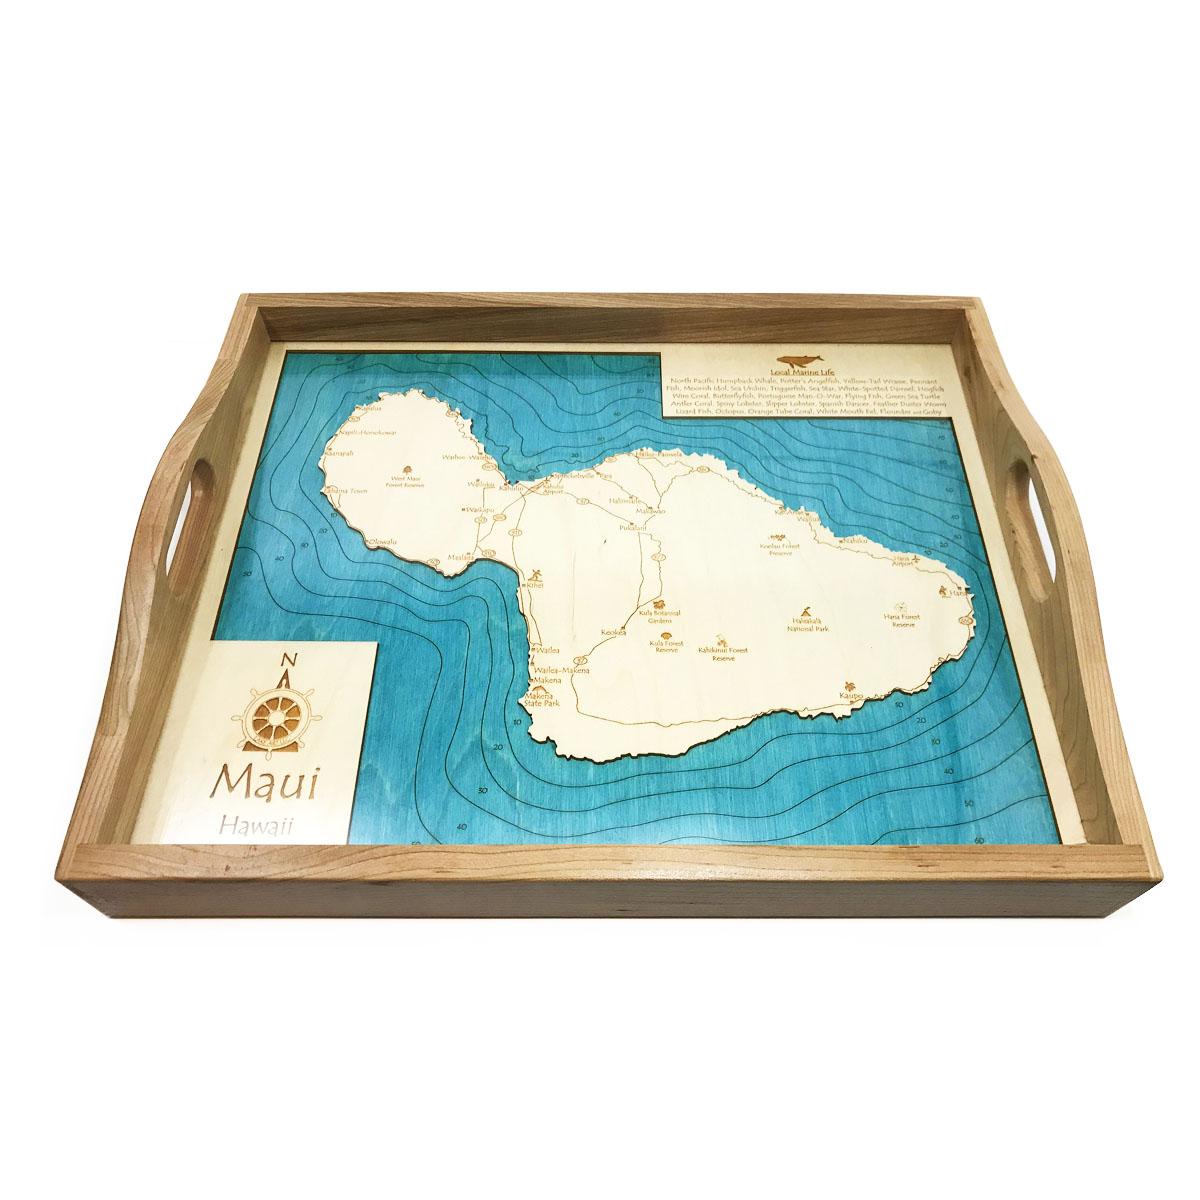 Maui Wood Map Serving Tray